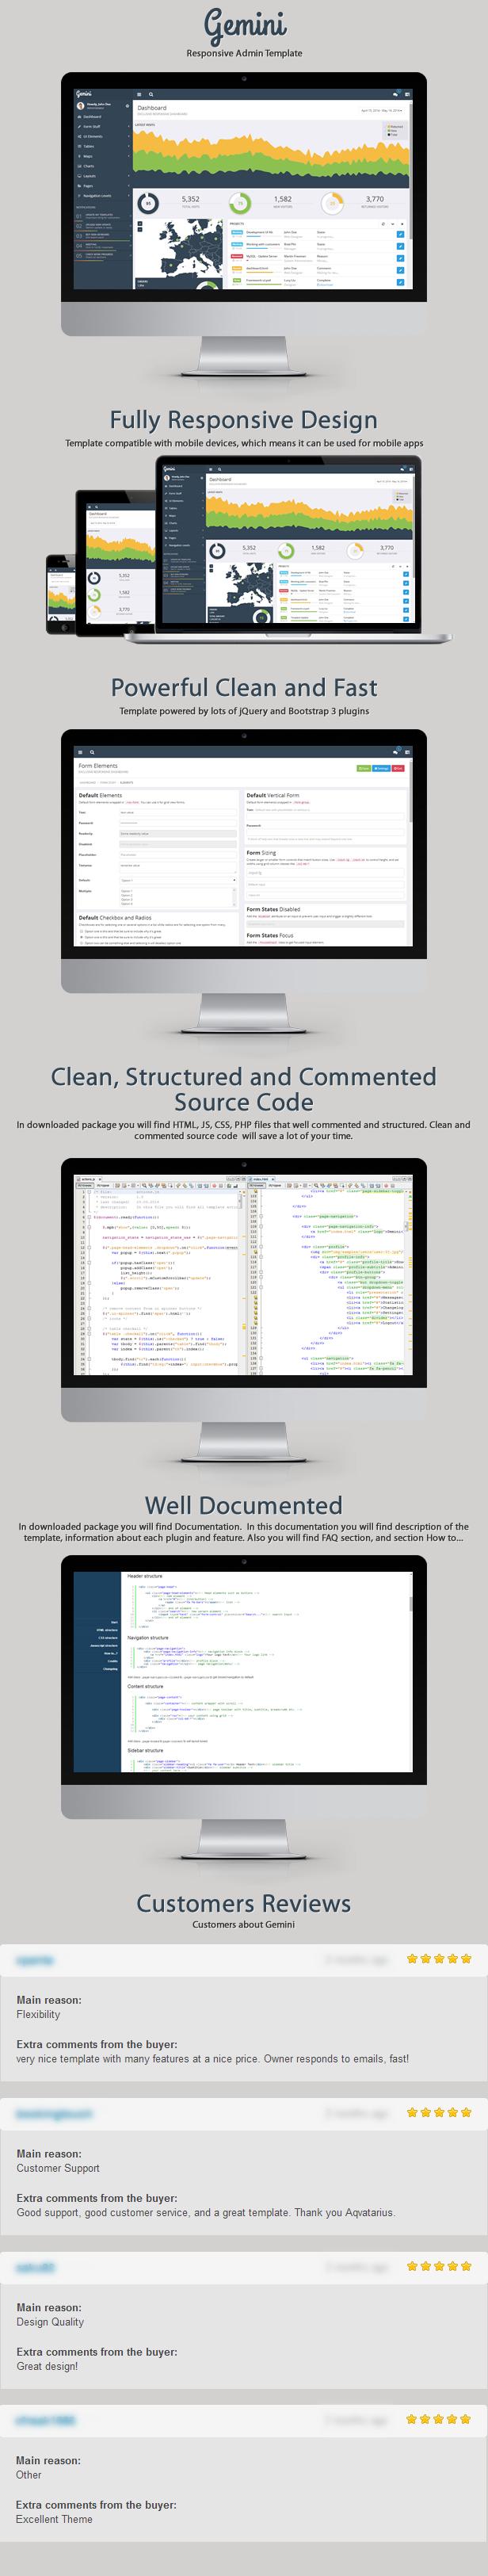 Gemini - Responsive Bootstrap Admin Template by Aqvatarius | ThemeForest